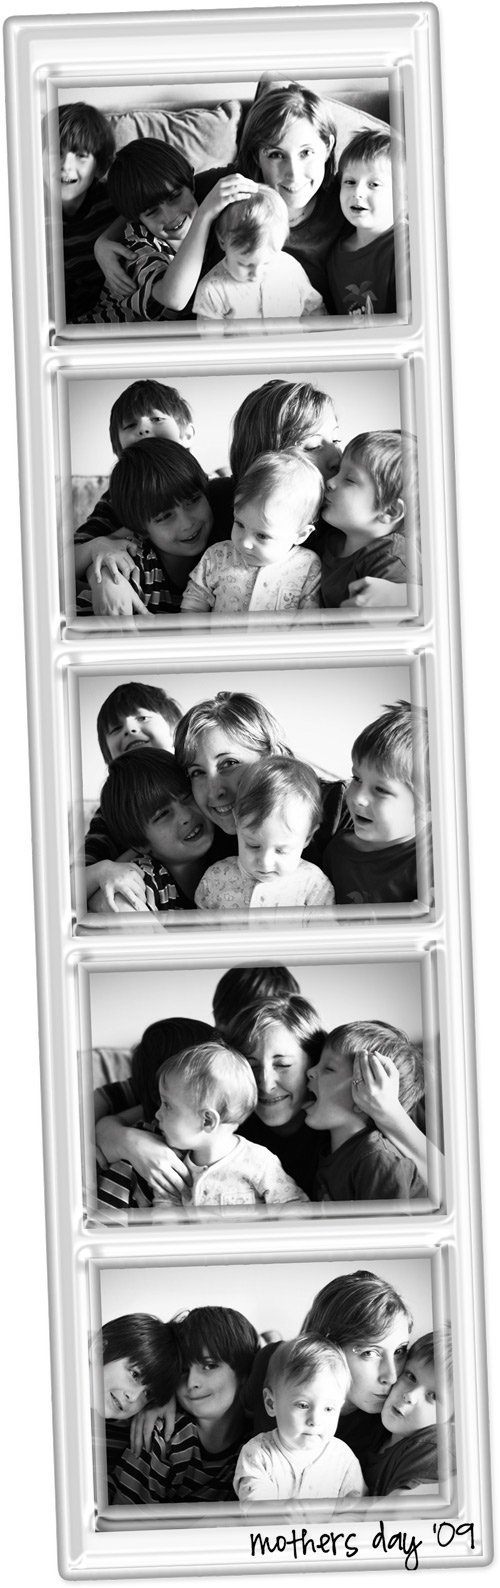 MothersDay2009